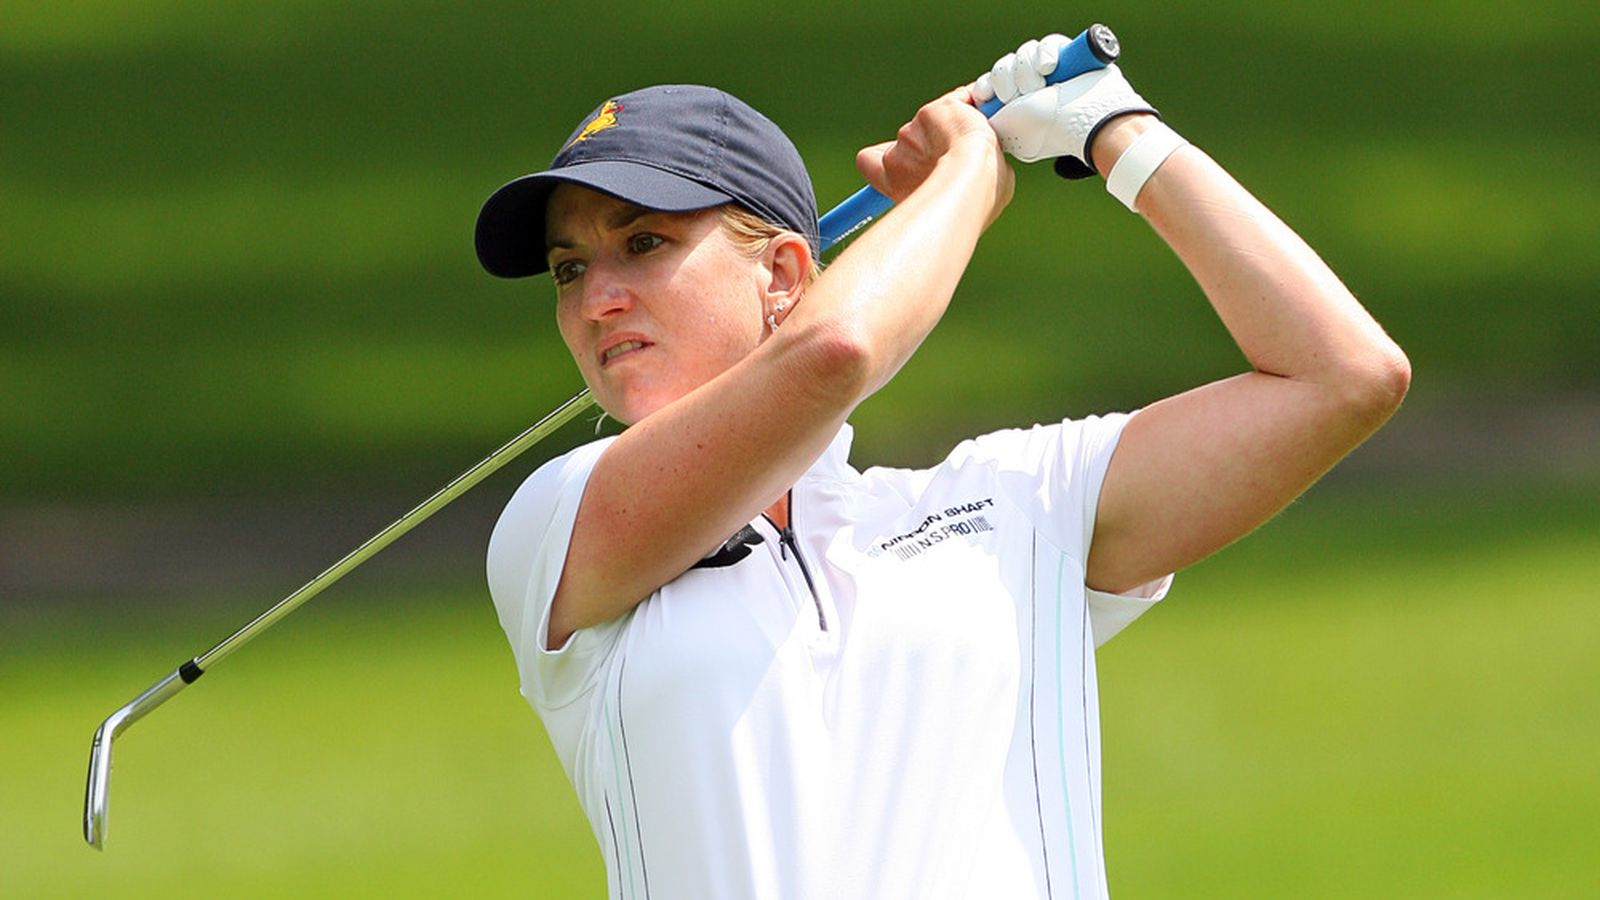 Wegmans LPGA锦标赛:因为Karrie Webb打赢,这就是为什么